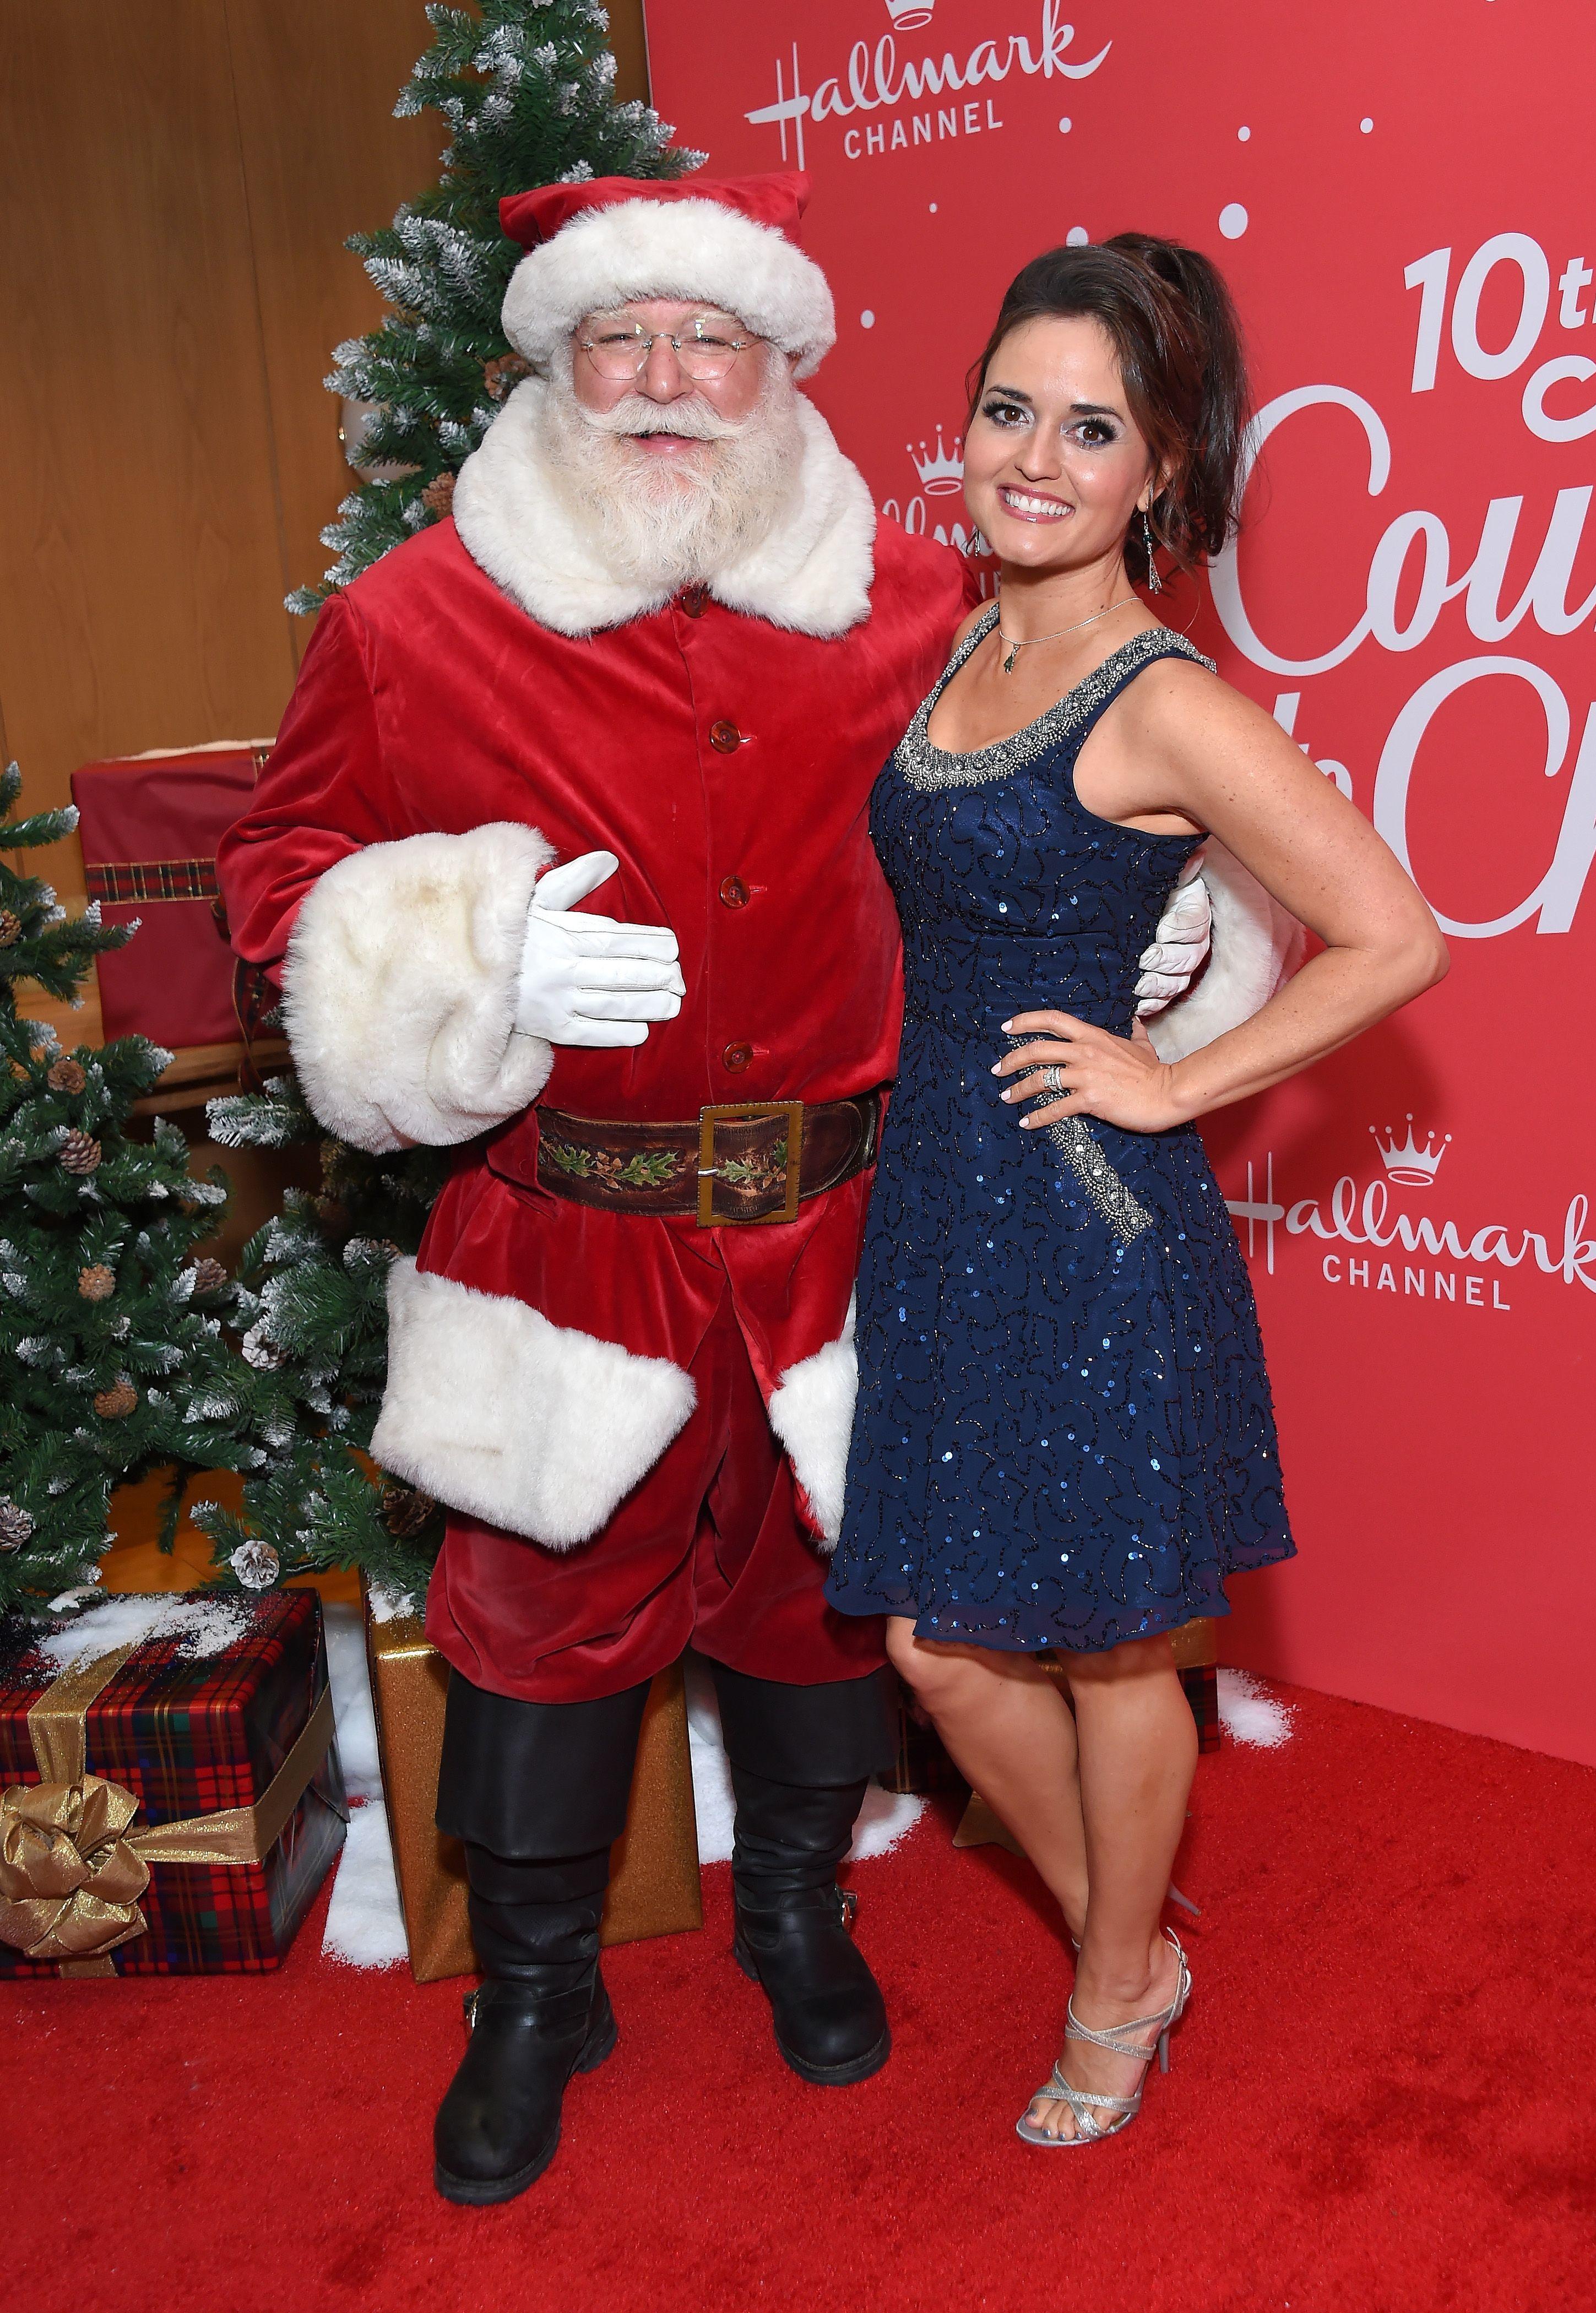 Danica McKellar and Santa - Week in celebrity photos for Nov. 18-22, 2019 | Gallery | Wonderwall.com